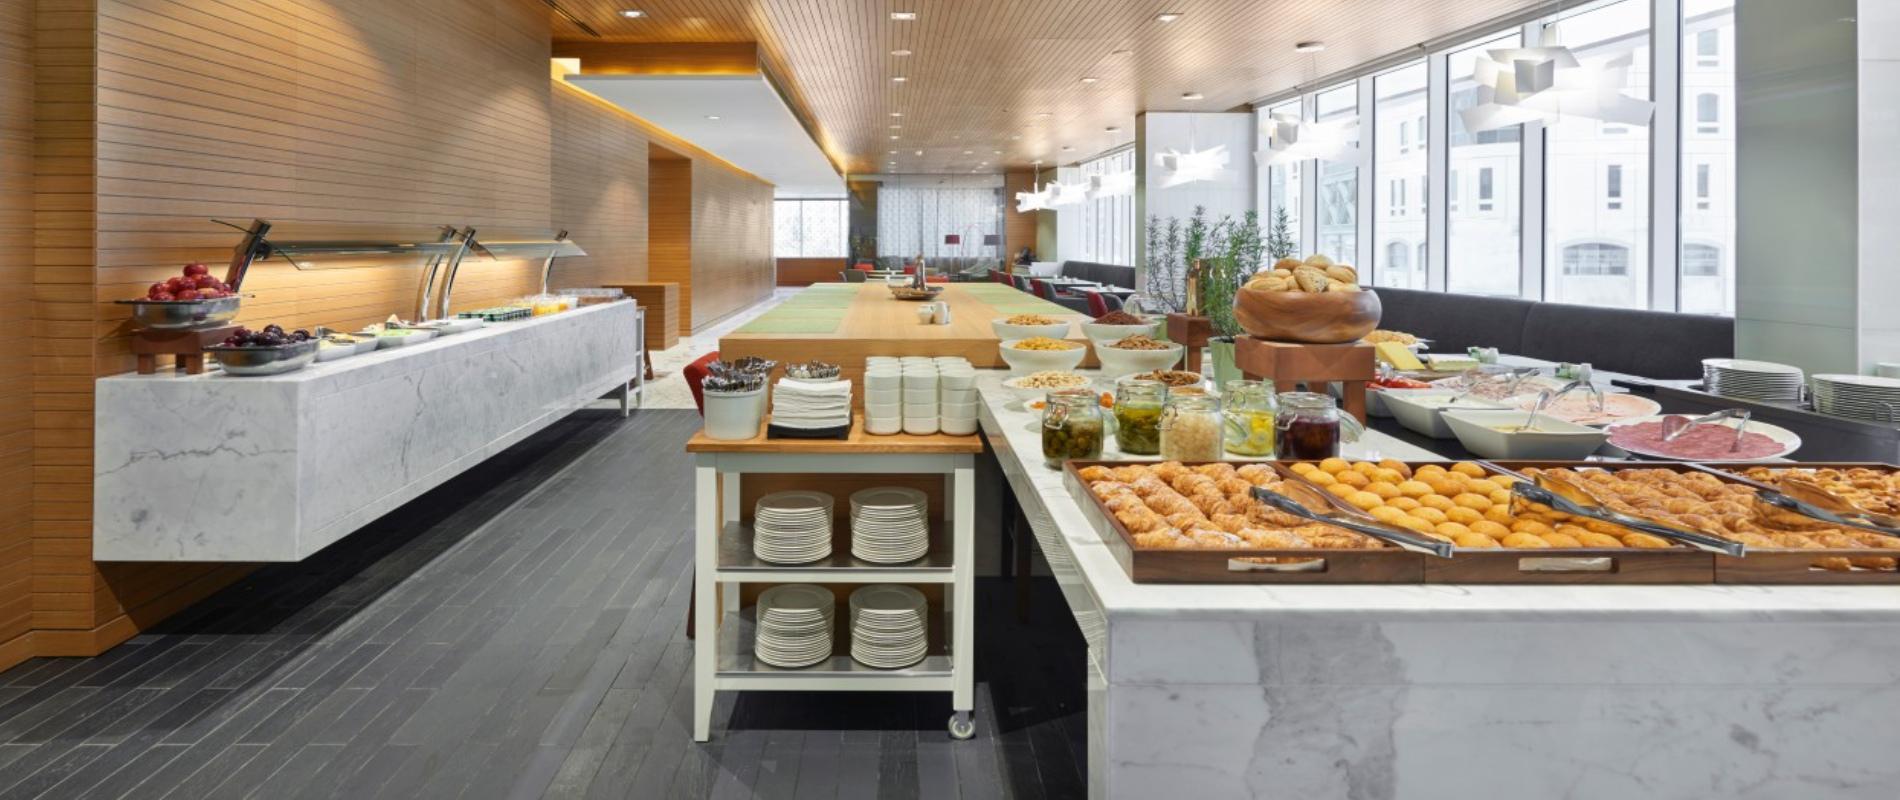 Breakfast Buffet - Hyatt Place Dubai Baniyas Square